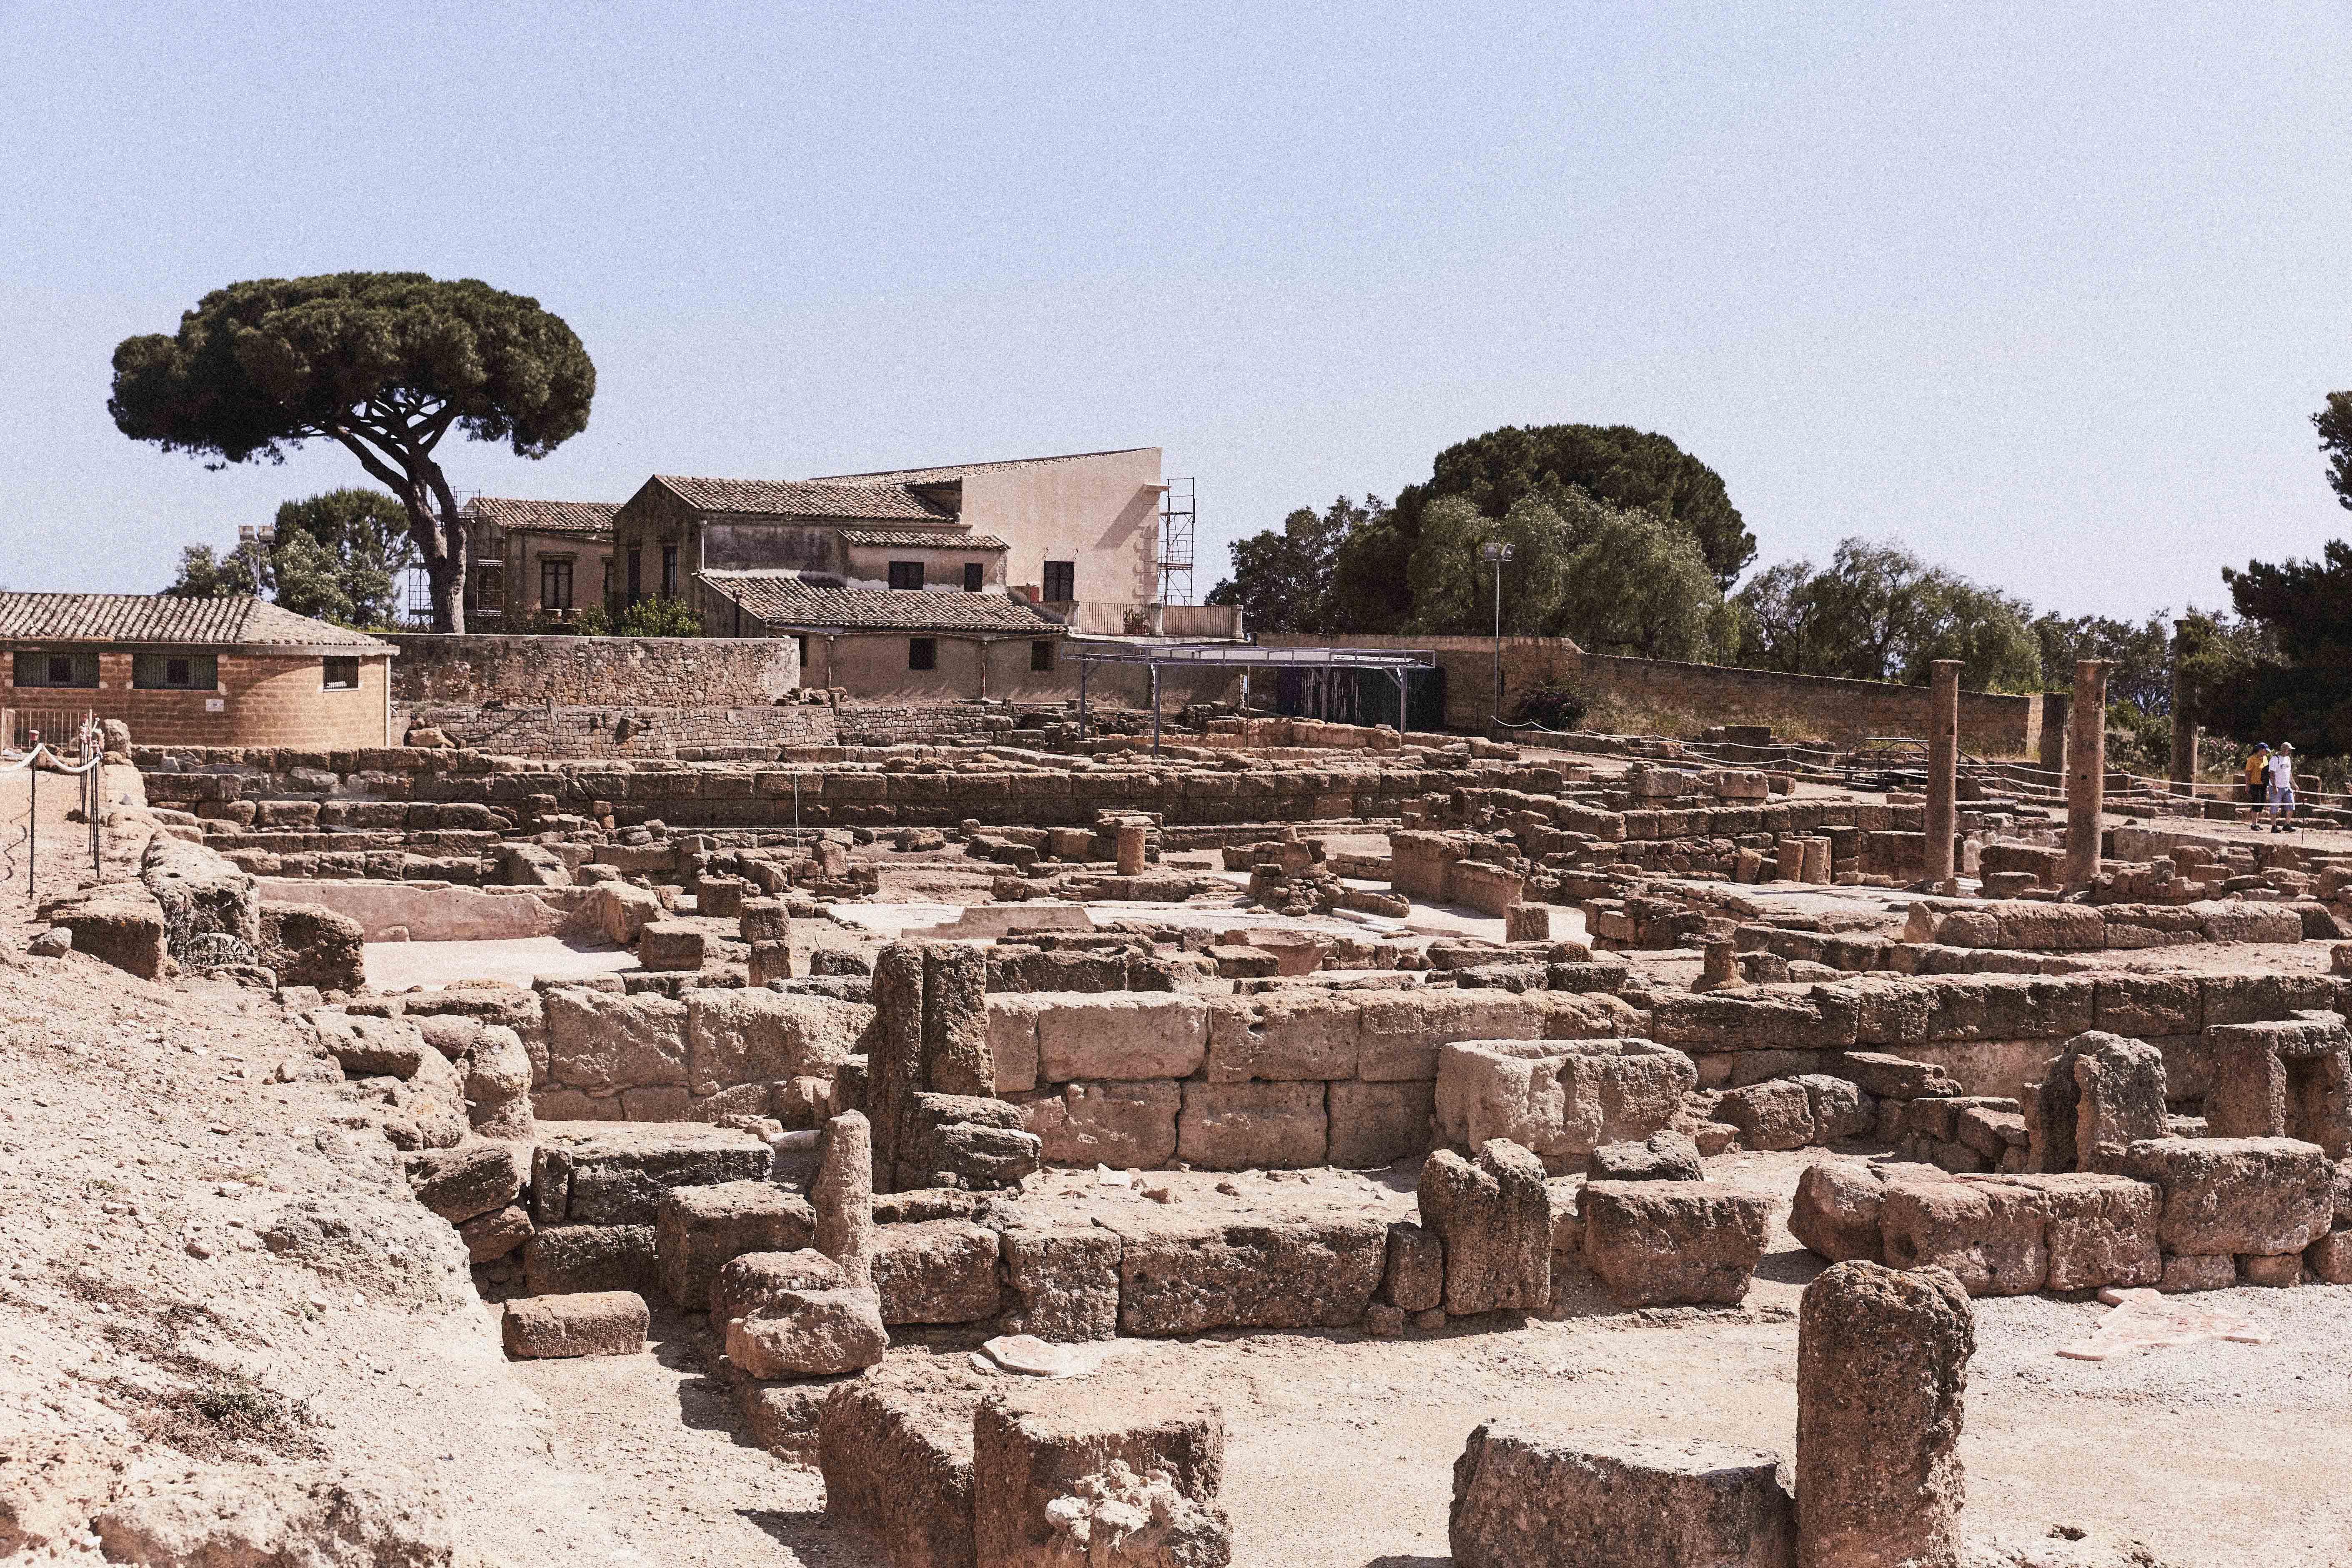 Sicily_0619_0P4A7817_X_X